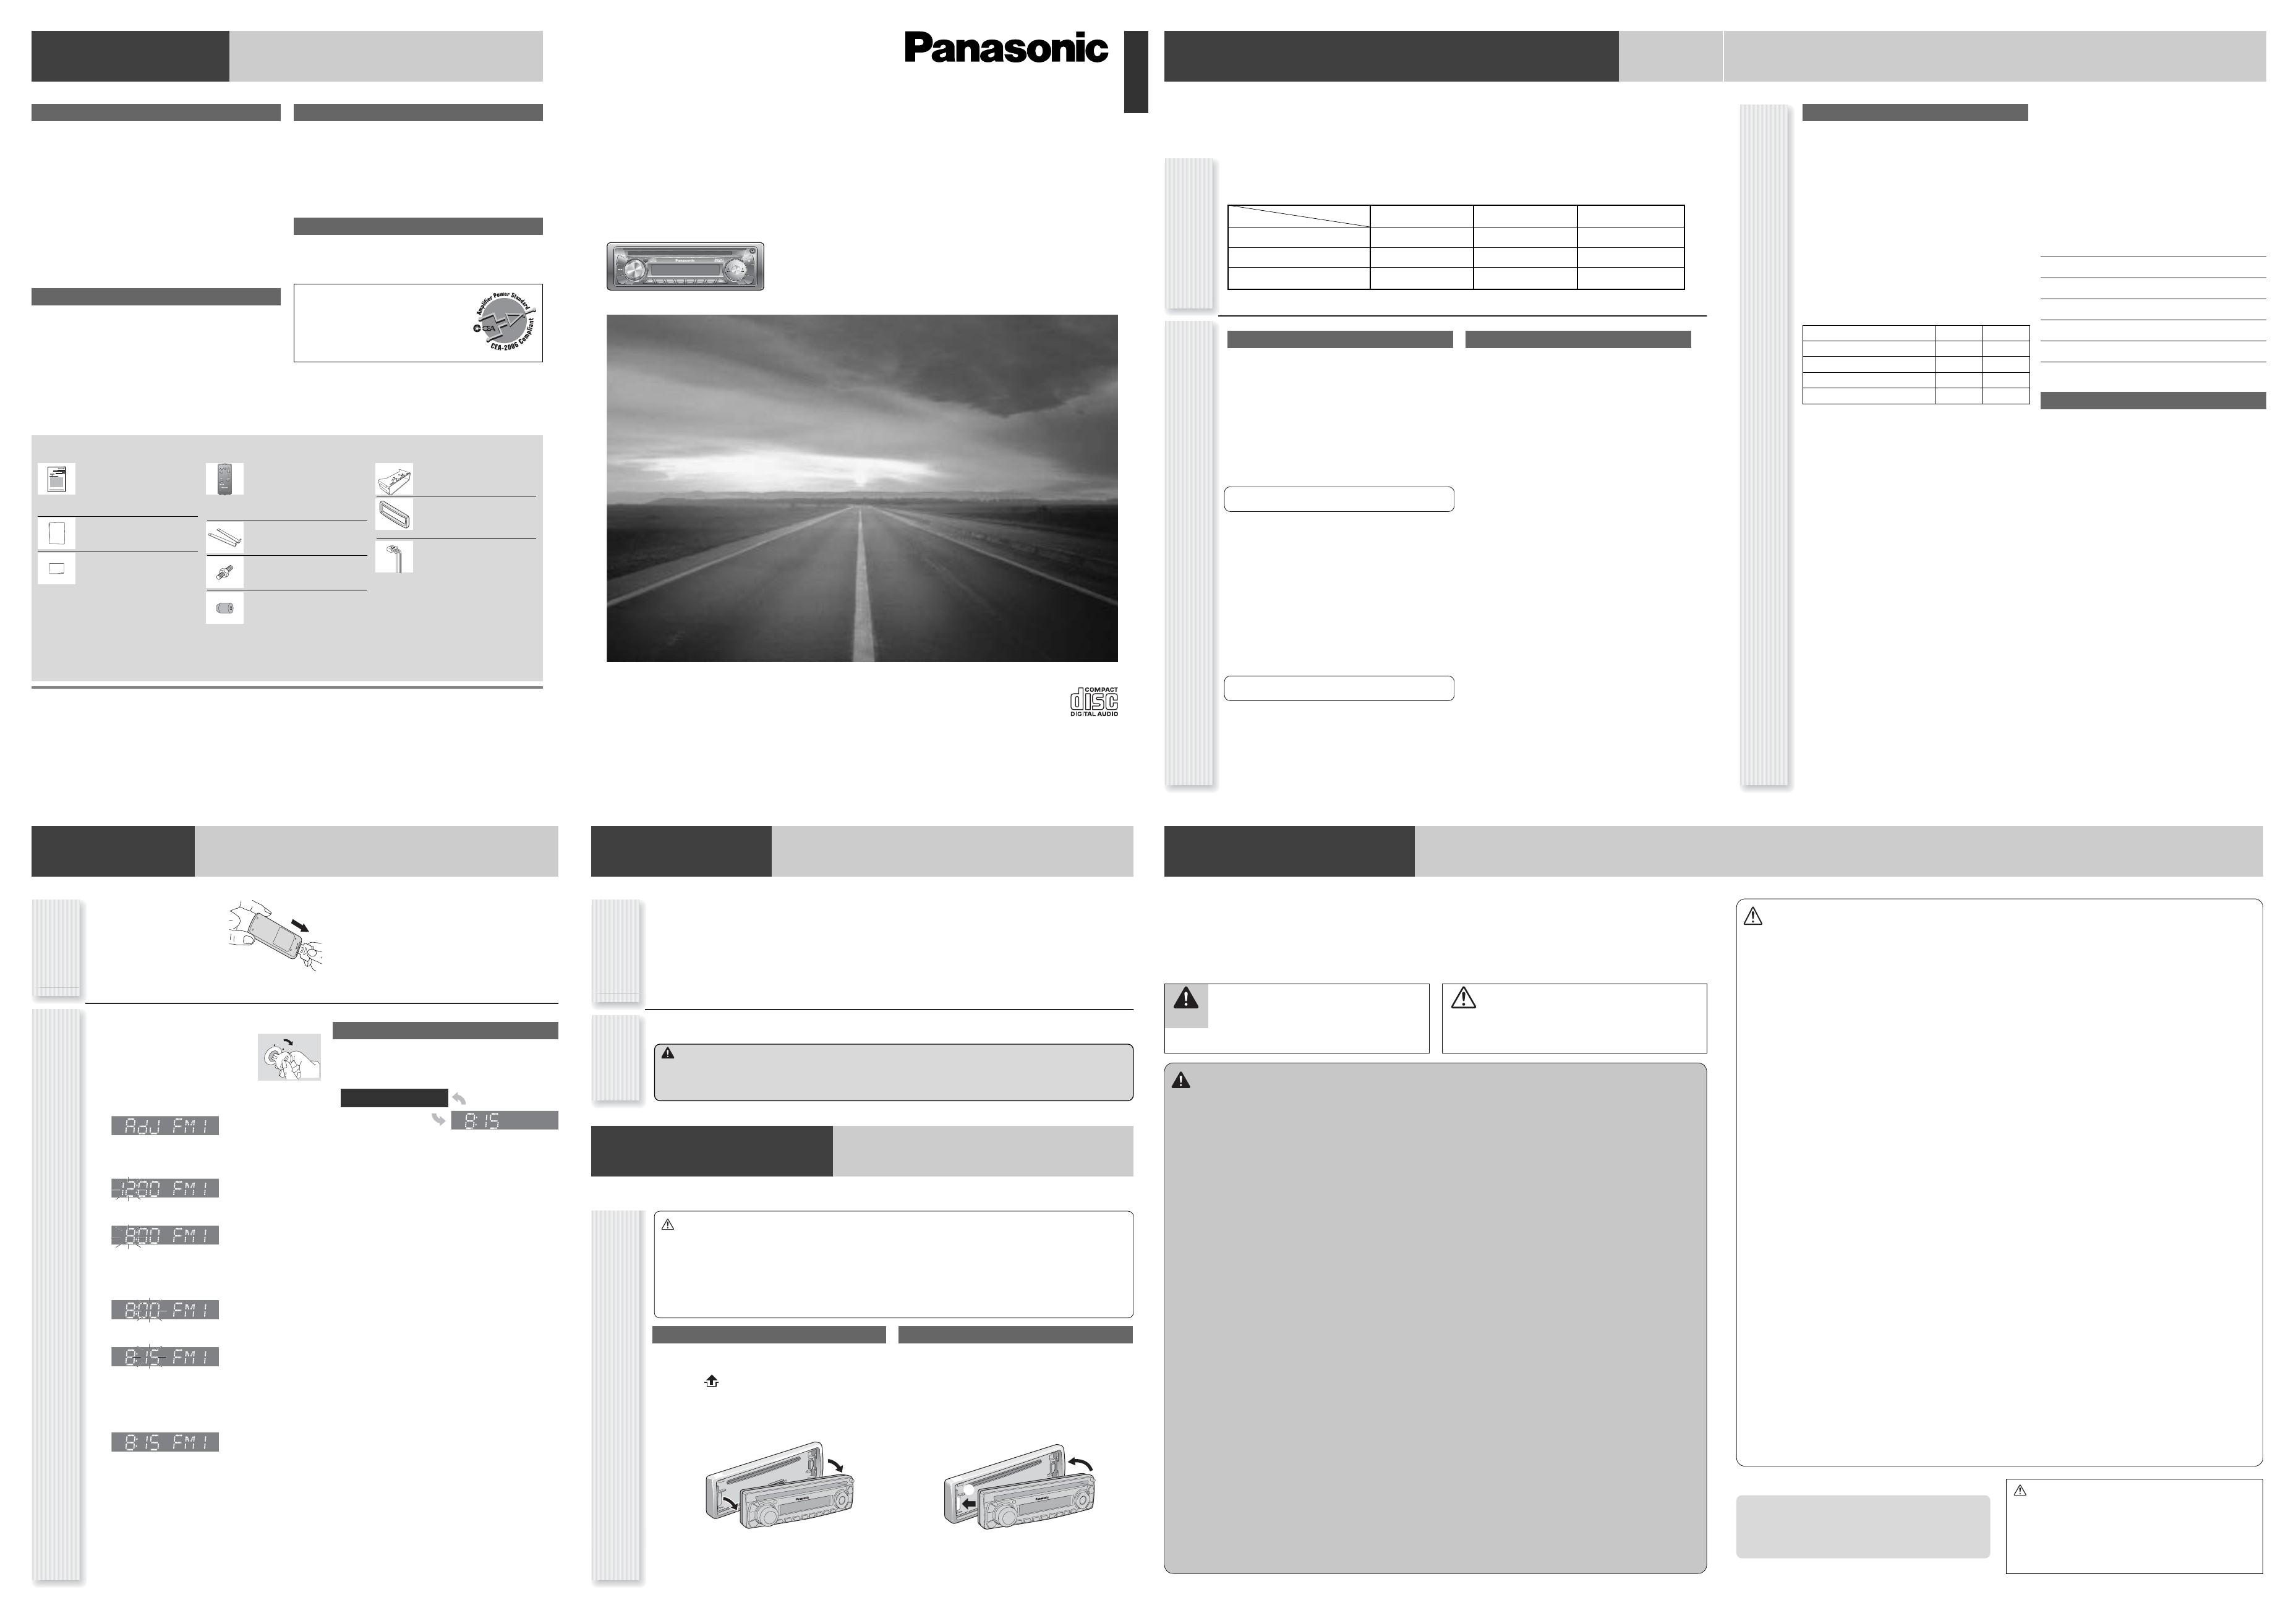 Panasonic CQ C1101U Car Stereo System User Manual